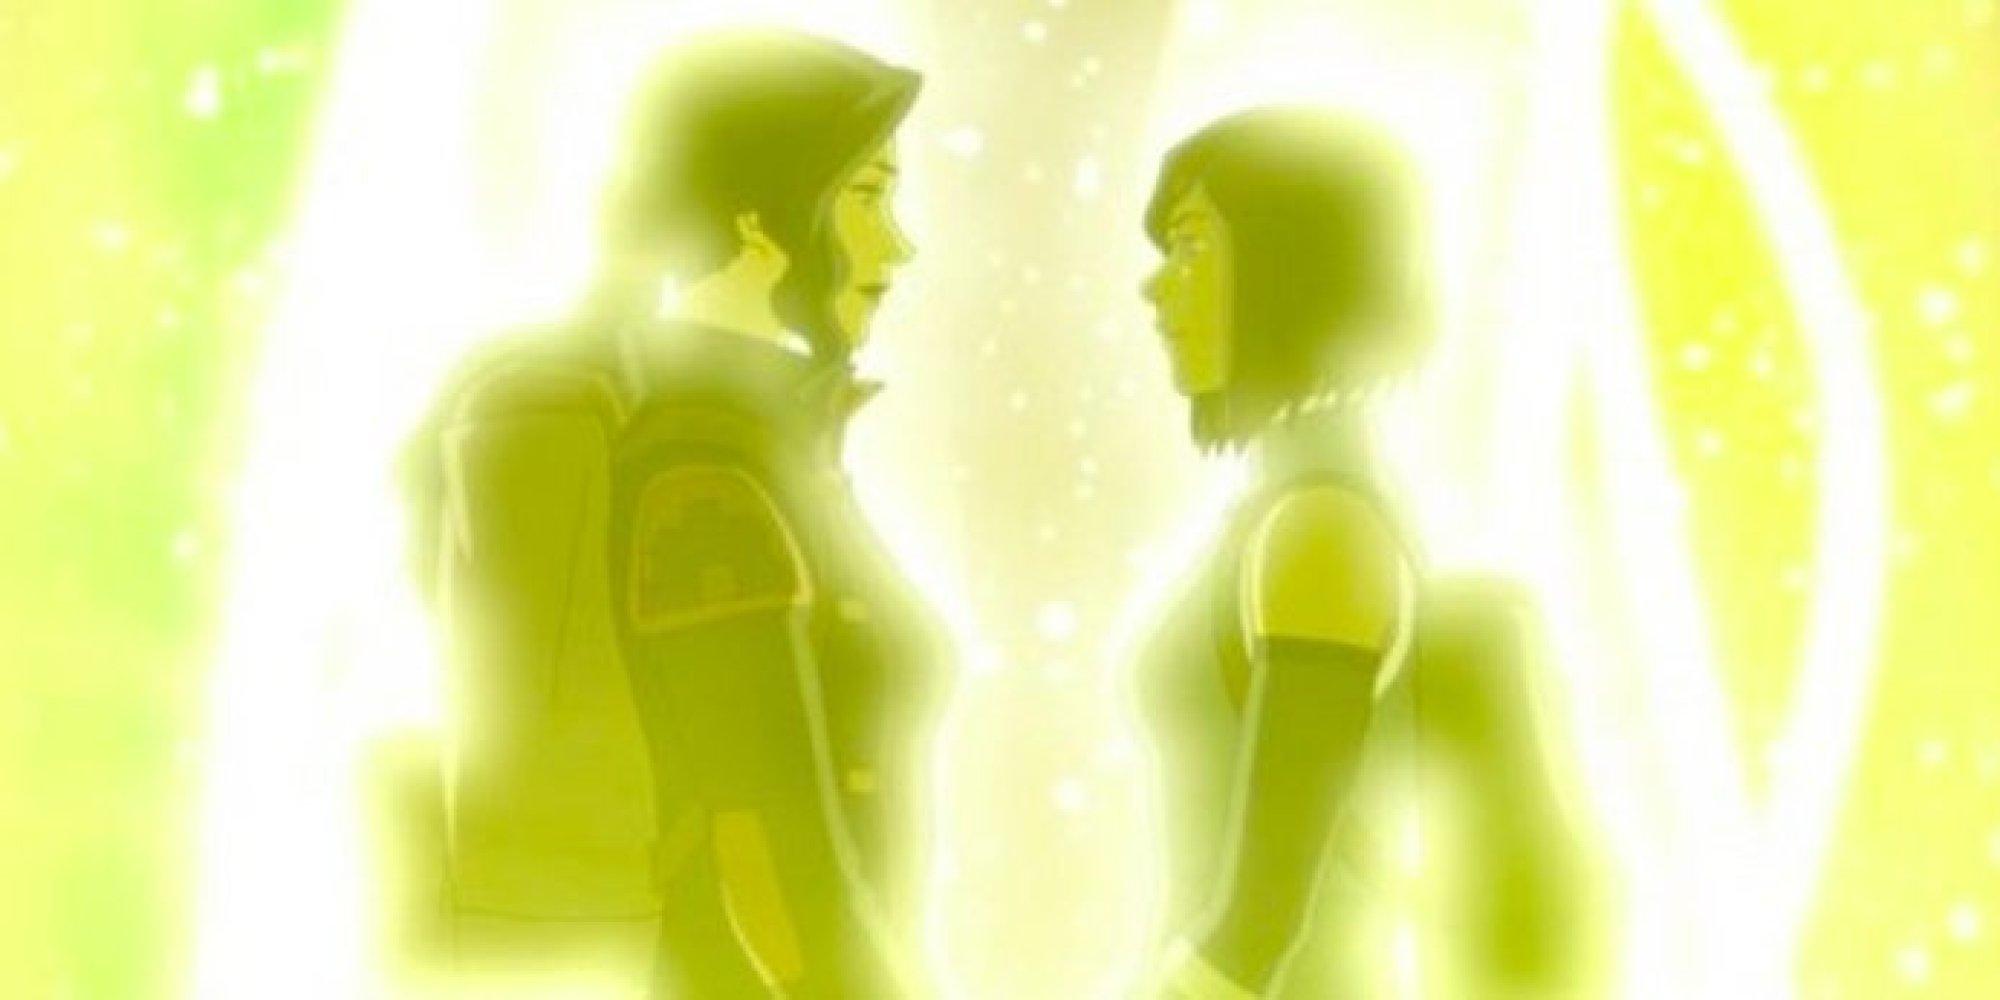 korra and asami kiss ending a relationship